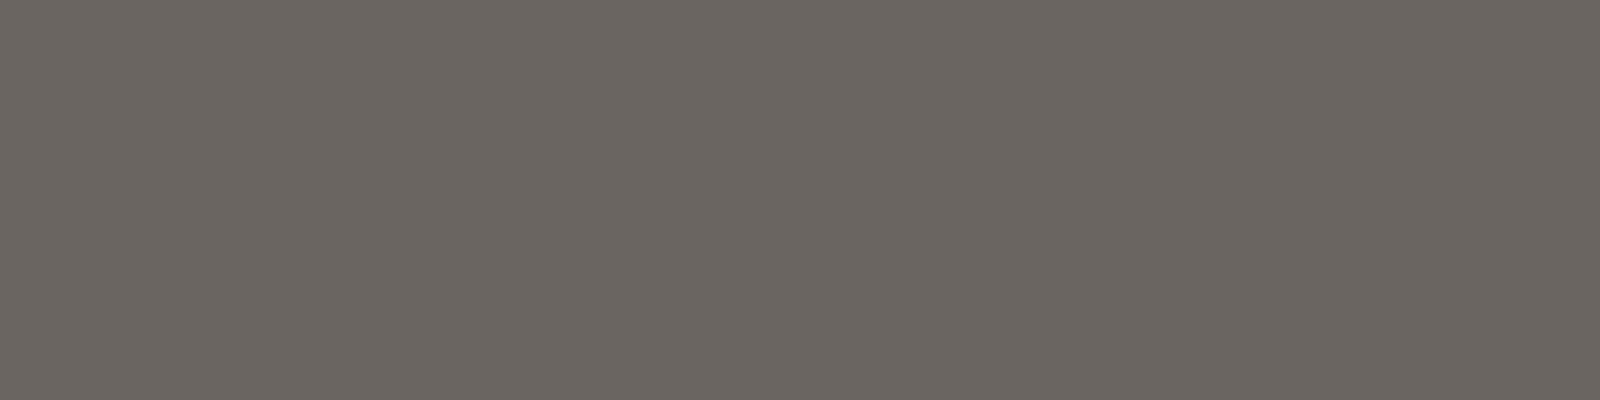 360 Terratone Gutter Color